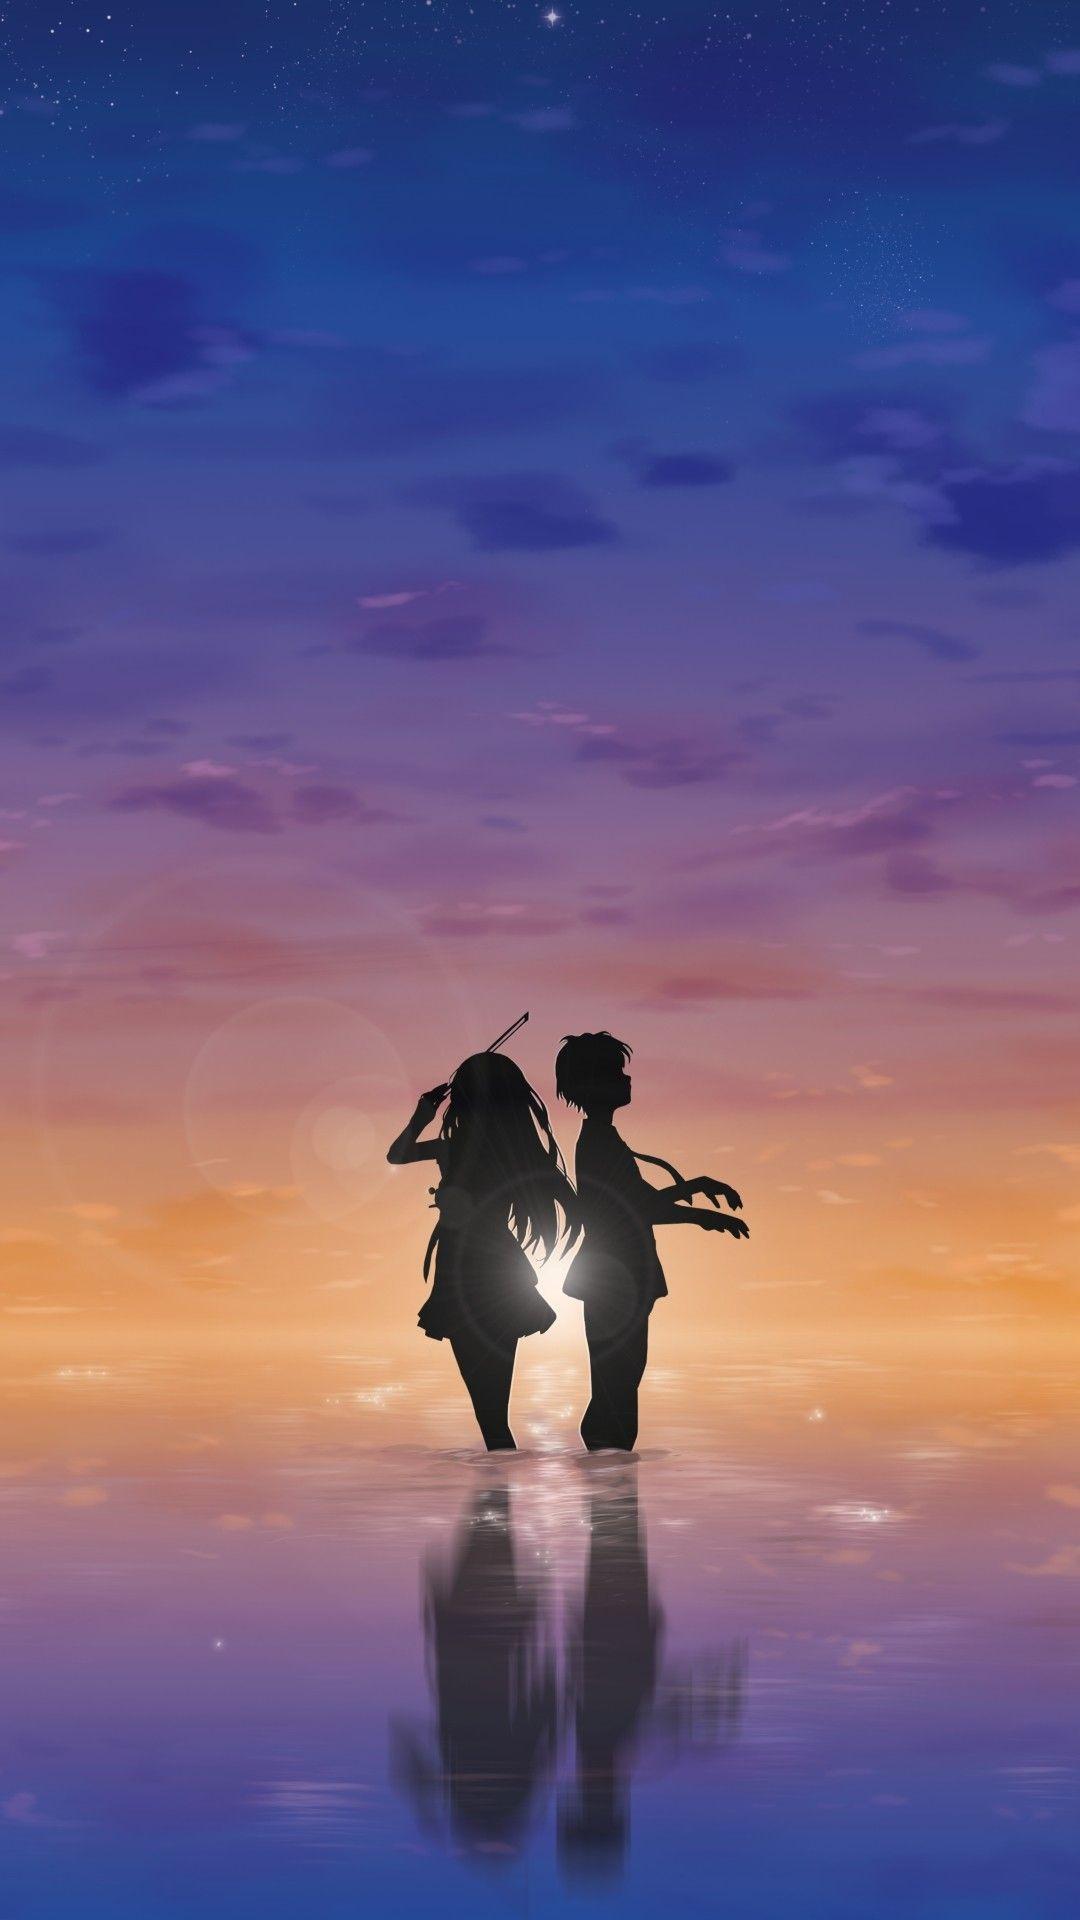 Shigatsu Wa Kimi No Uso Fondo Your Lie In April Anime Scenery Lie In April